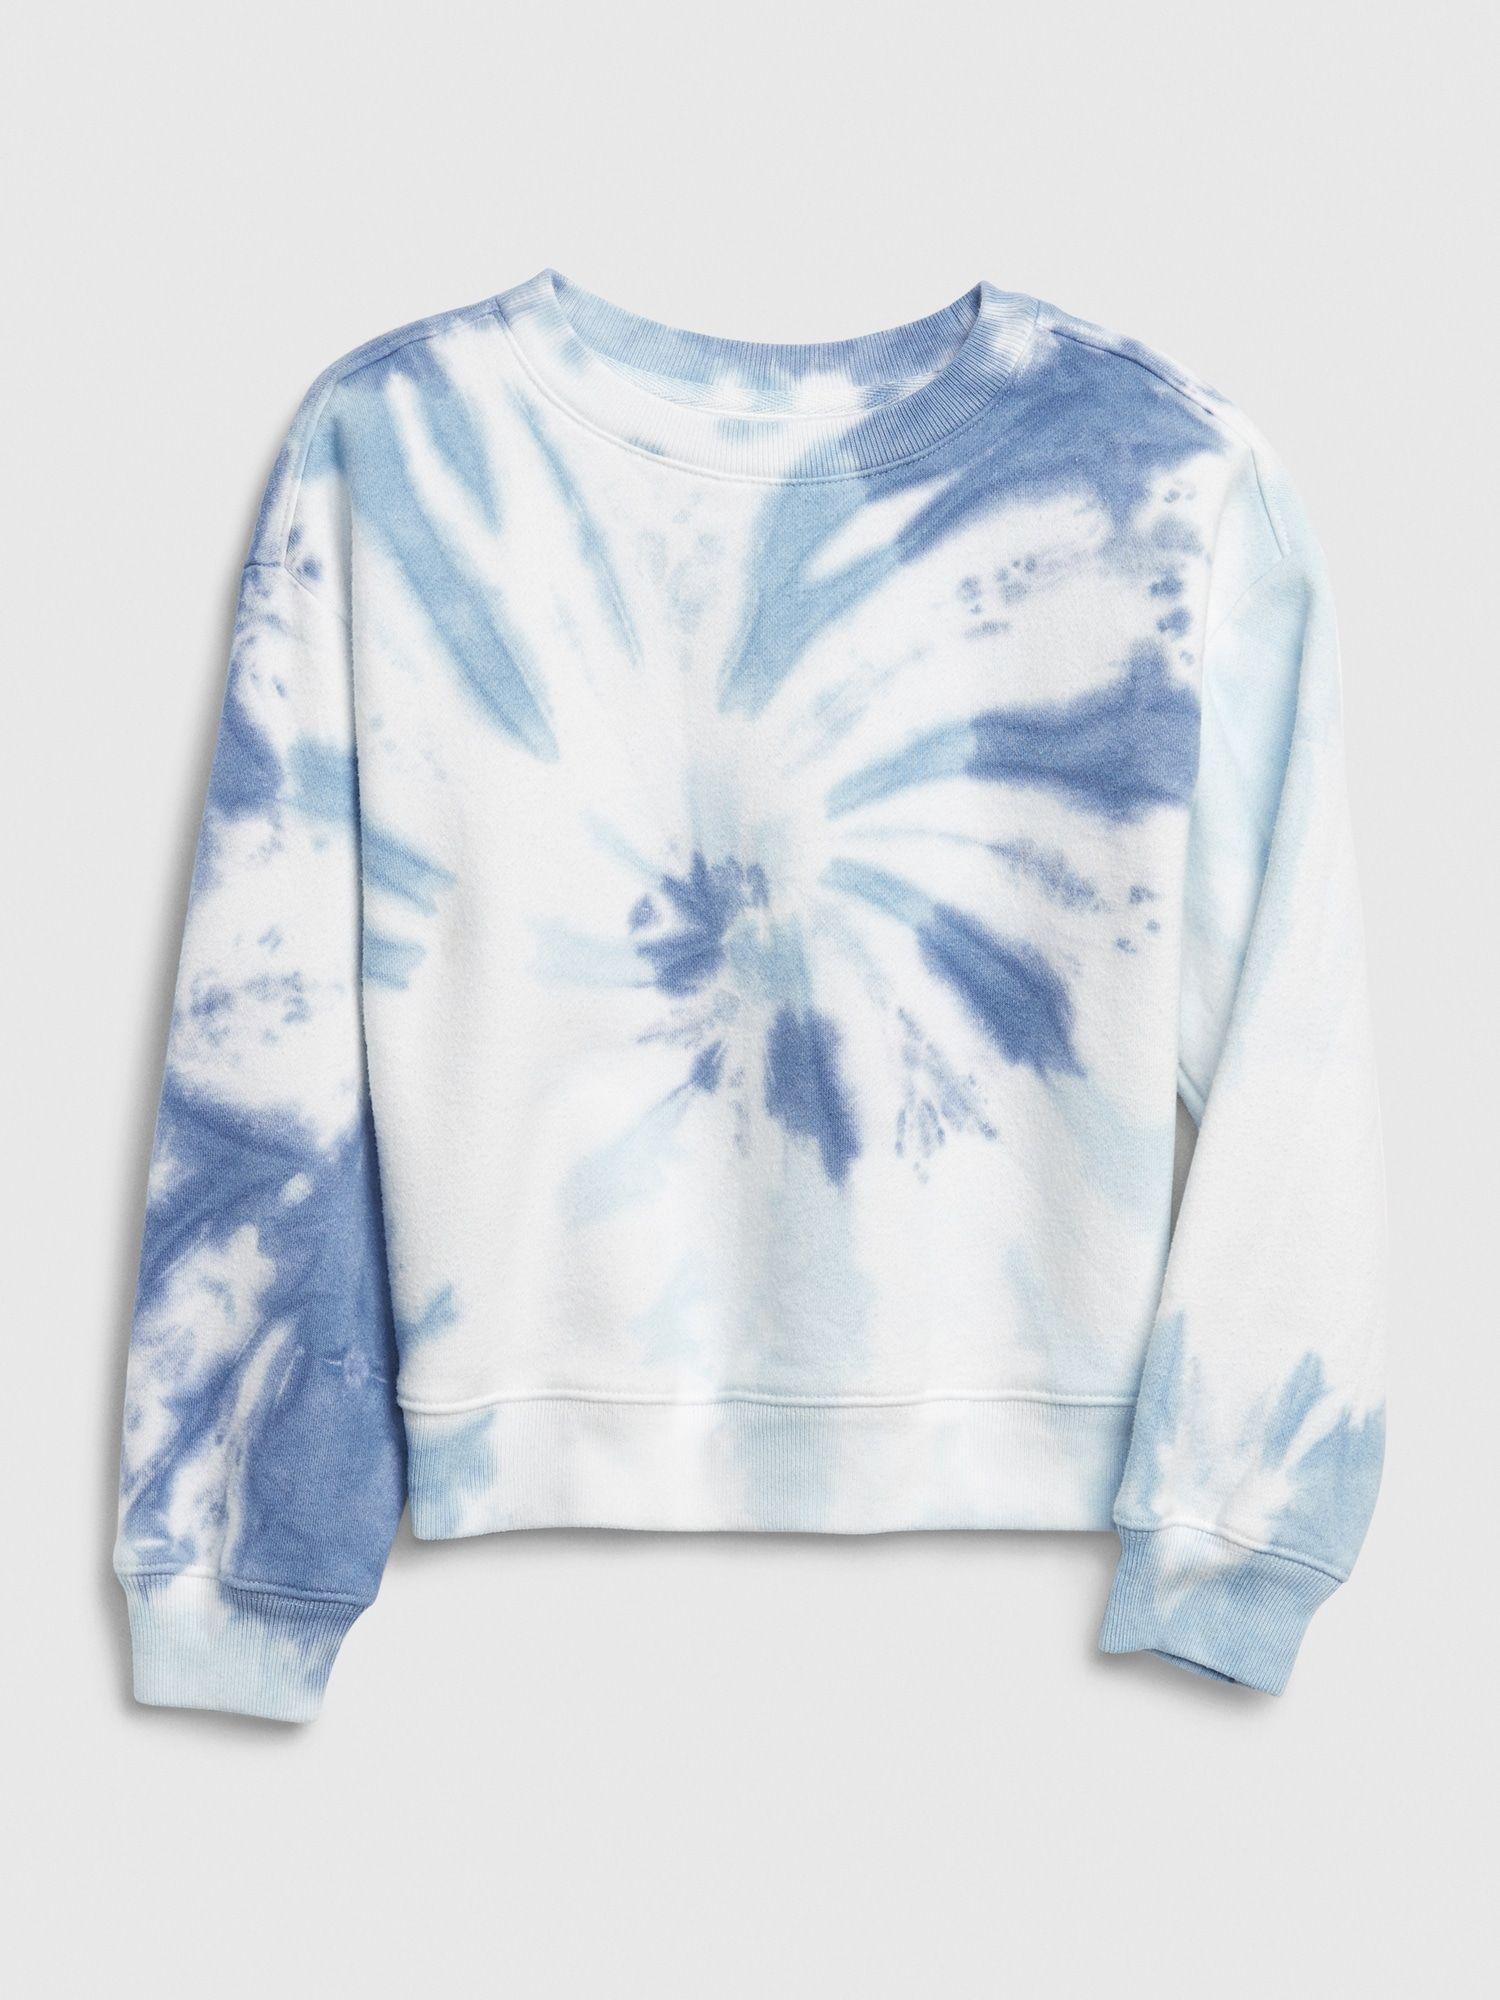 Gap Kids Tie Dye Crewneck Sweatshirt Radial Blue Tie Dye Tie Dye Girl Sweatshirts Tie Dye Crewneck Sweatshirts [ 2000 x 1500 Pixel ]